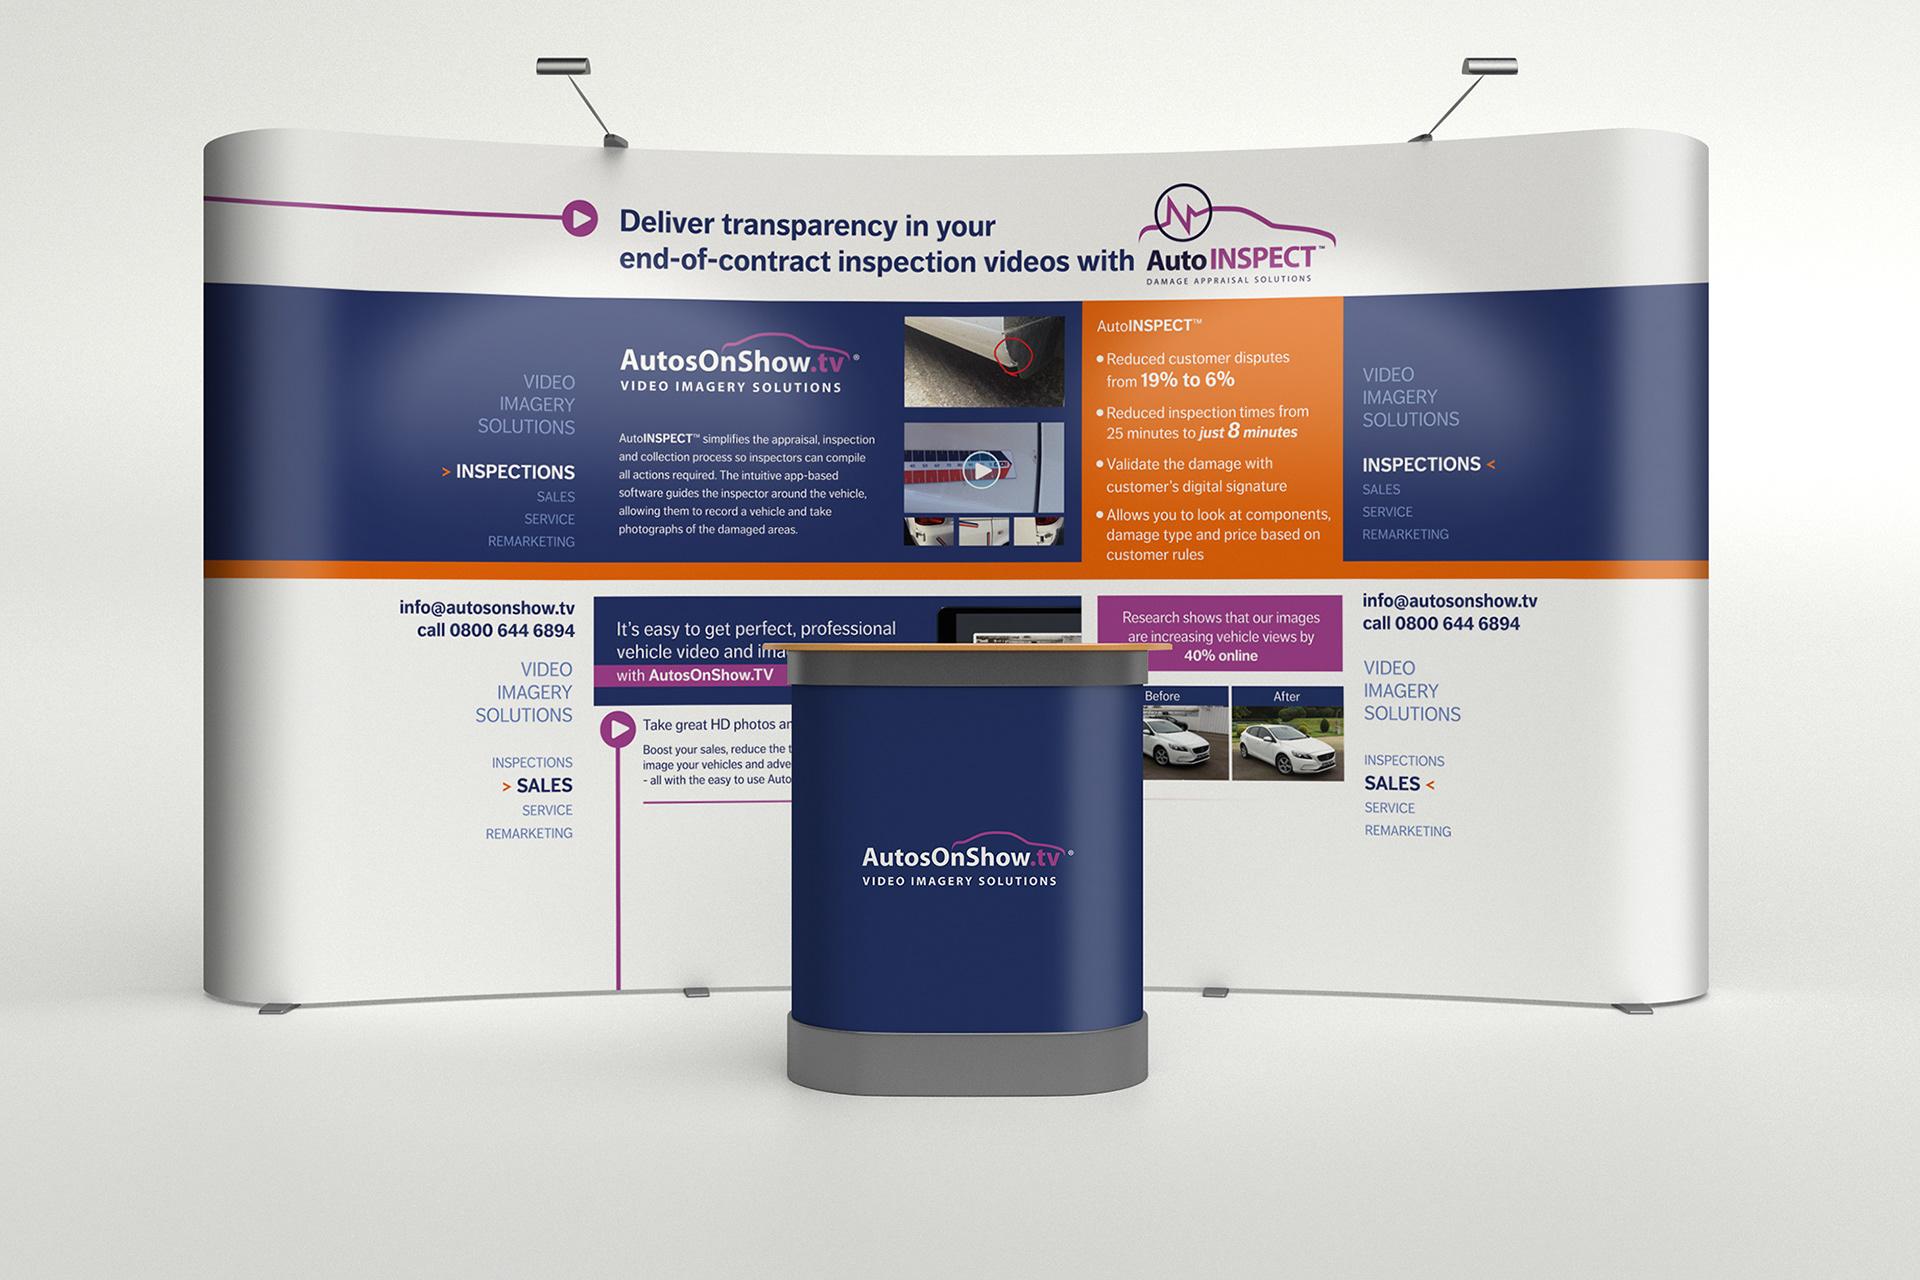 Marketing Exhibition Stand Years : Deavall design freelance graphic design branding online